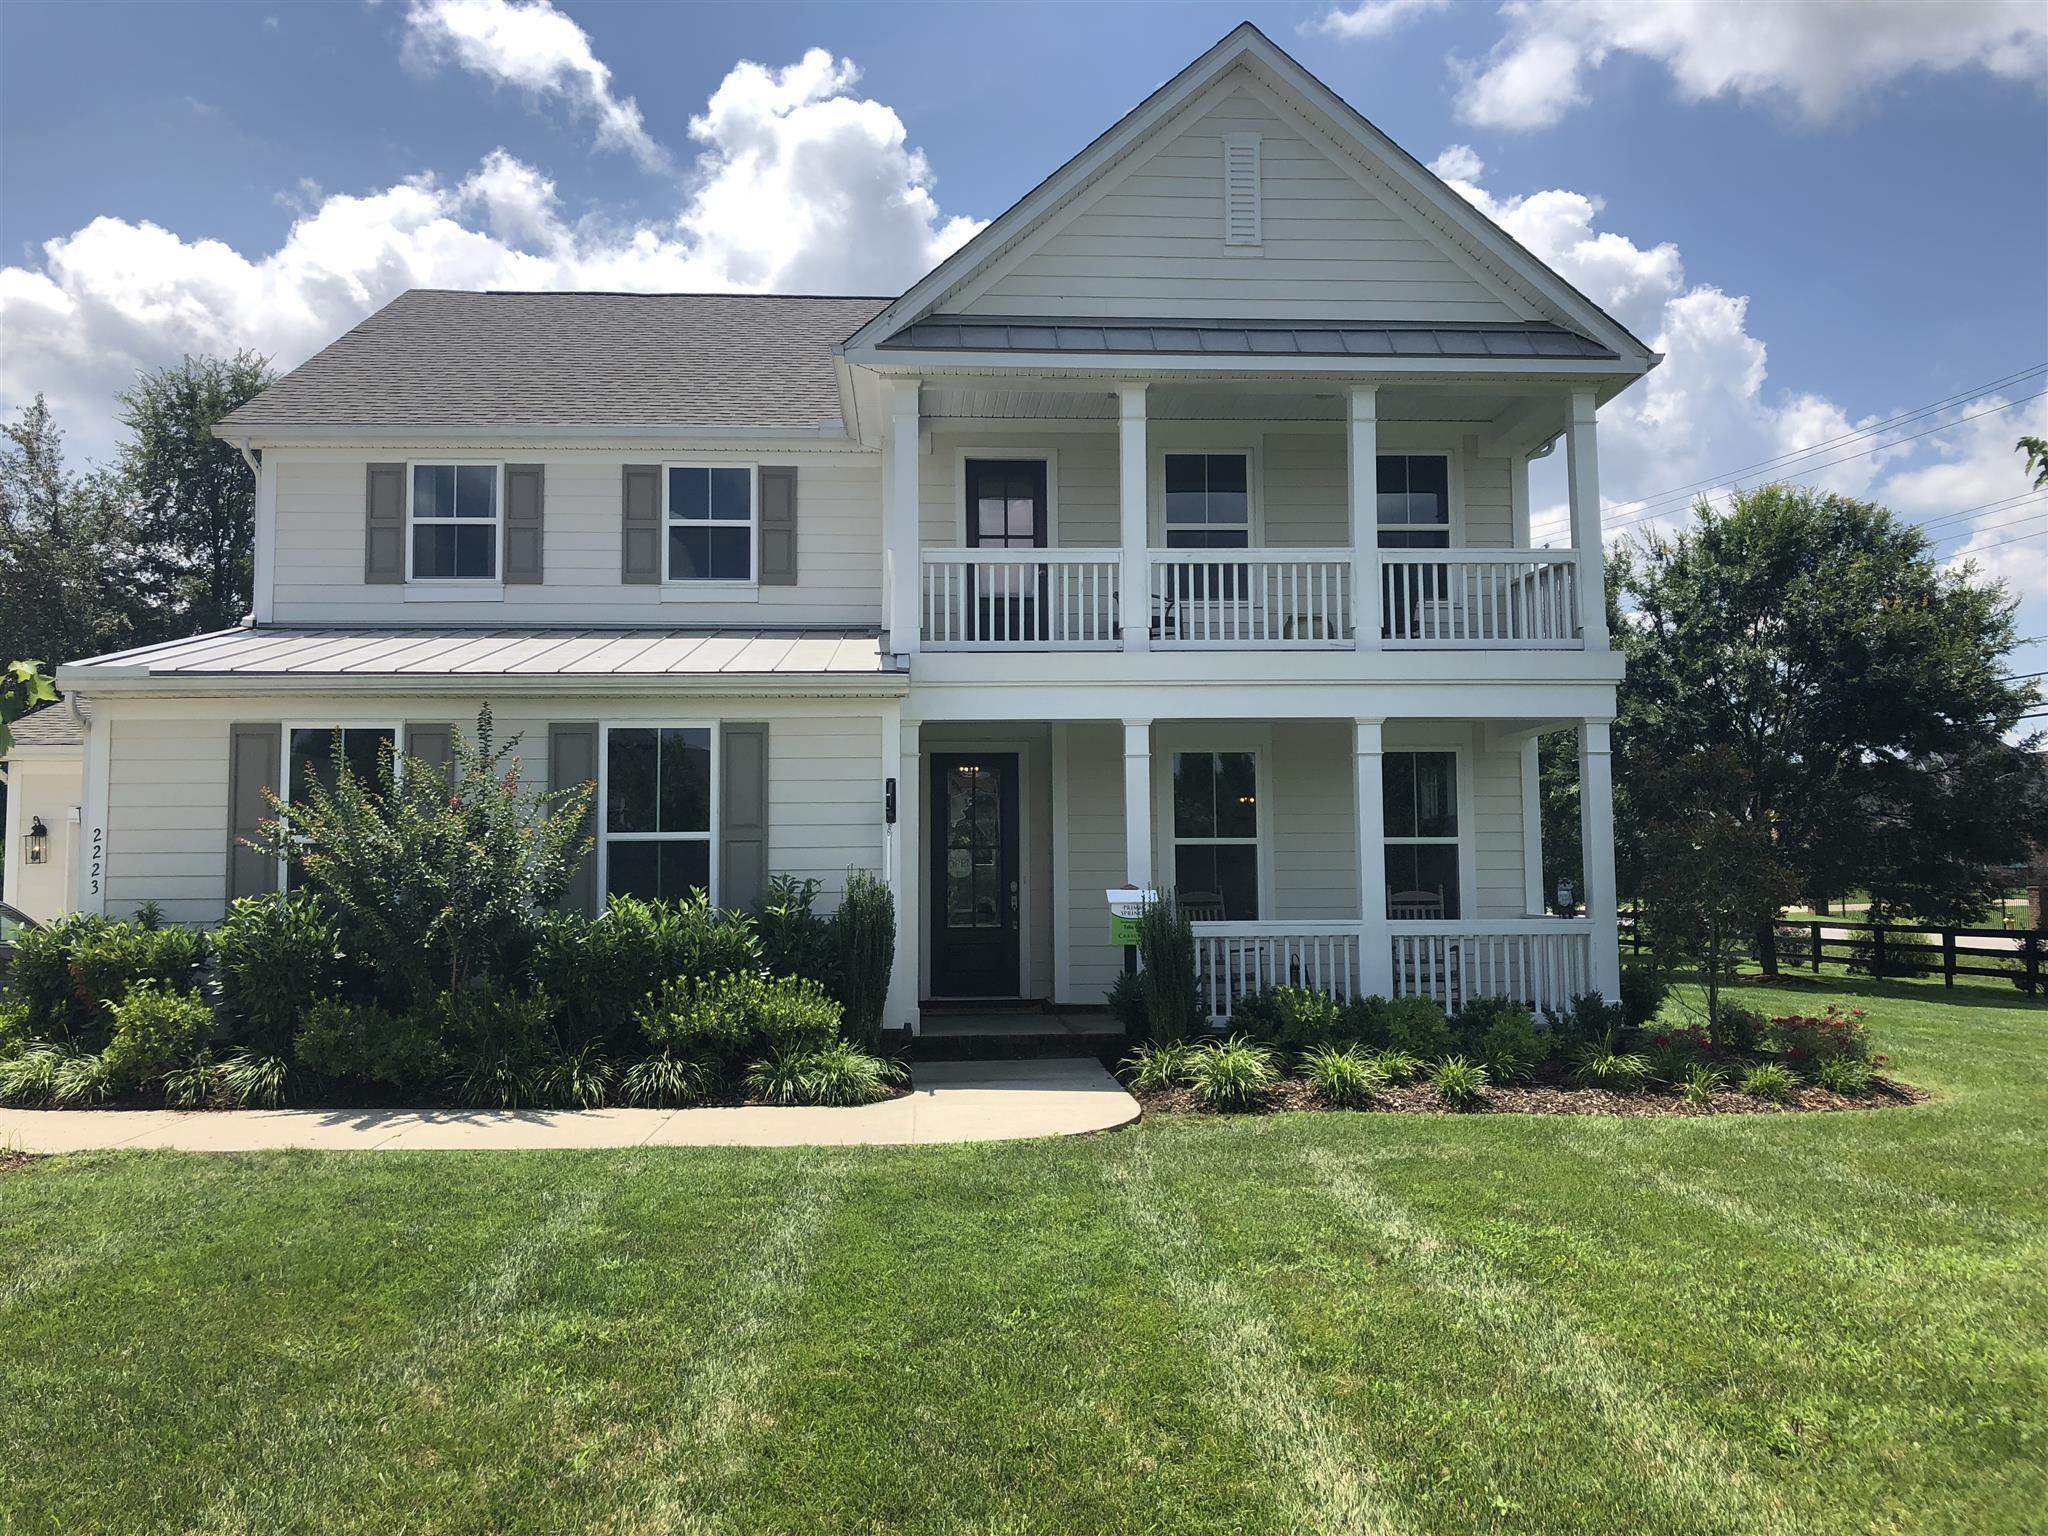 2223 Clays Mill Dr , Murfreesboro, TN 37129 - Murfreesboro, TN real estate listing